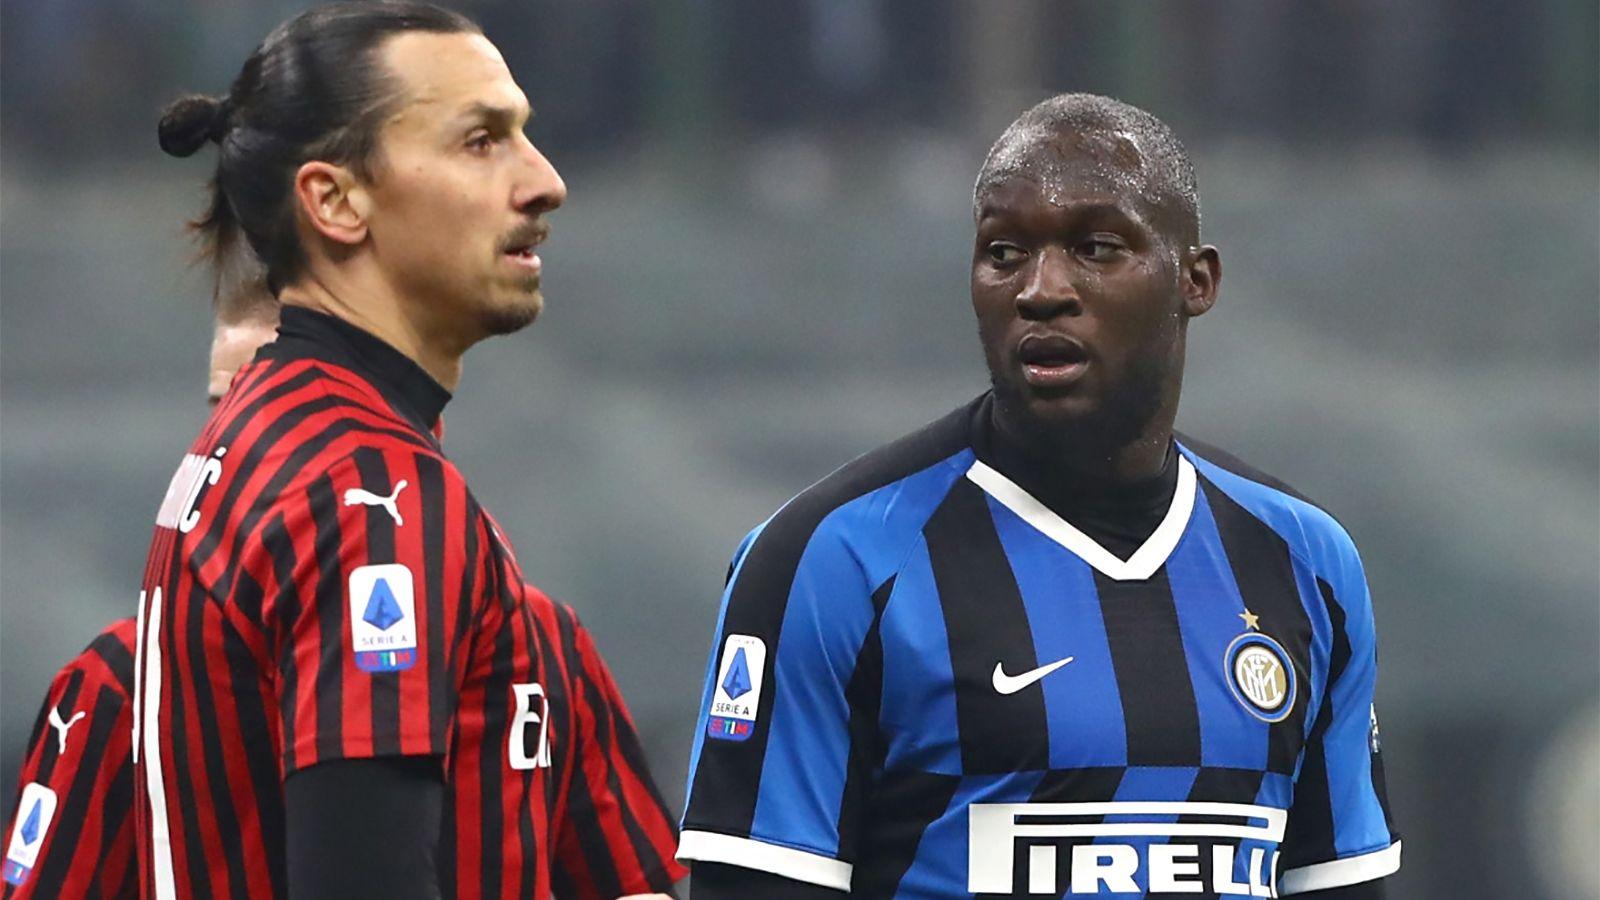 Точный прогноз на матч Милан – Интер 21.02.2021